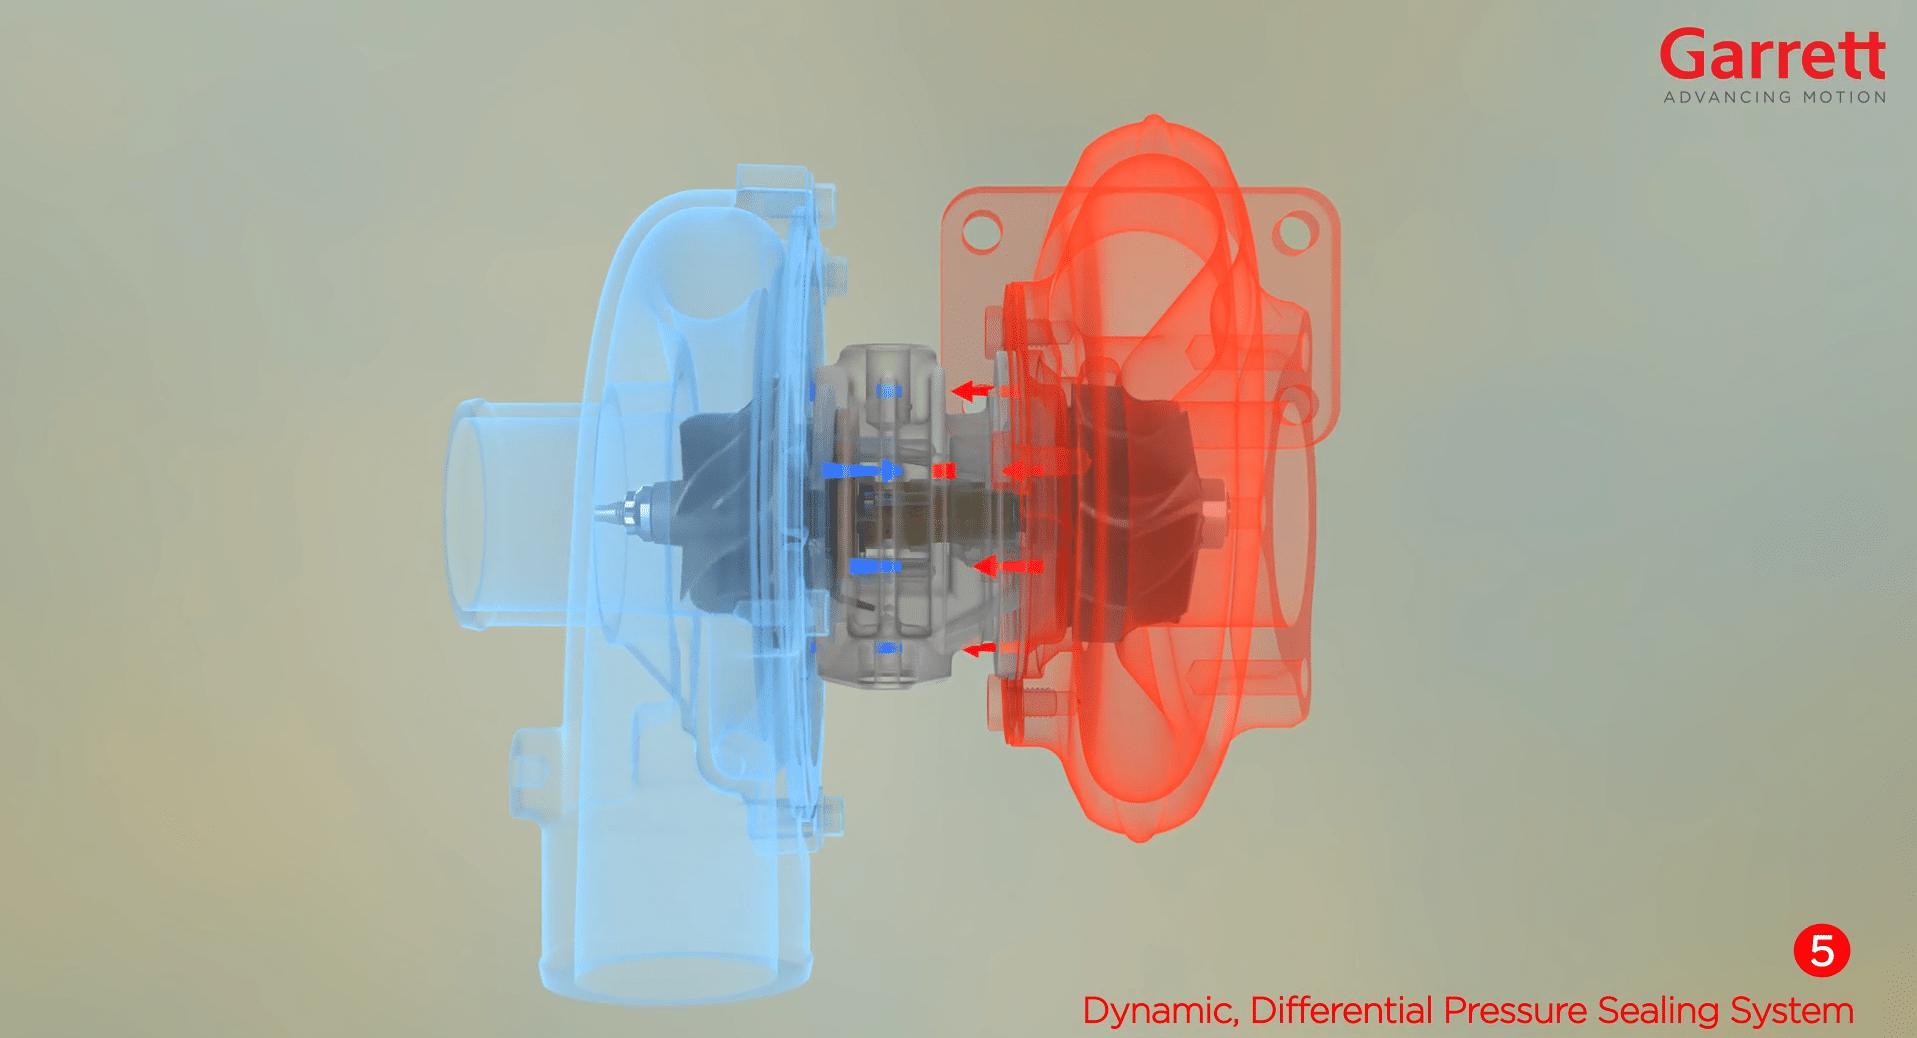 Garrett Motion Dynamic, Differential Pressure Sealing System